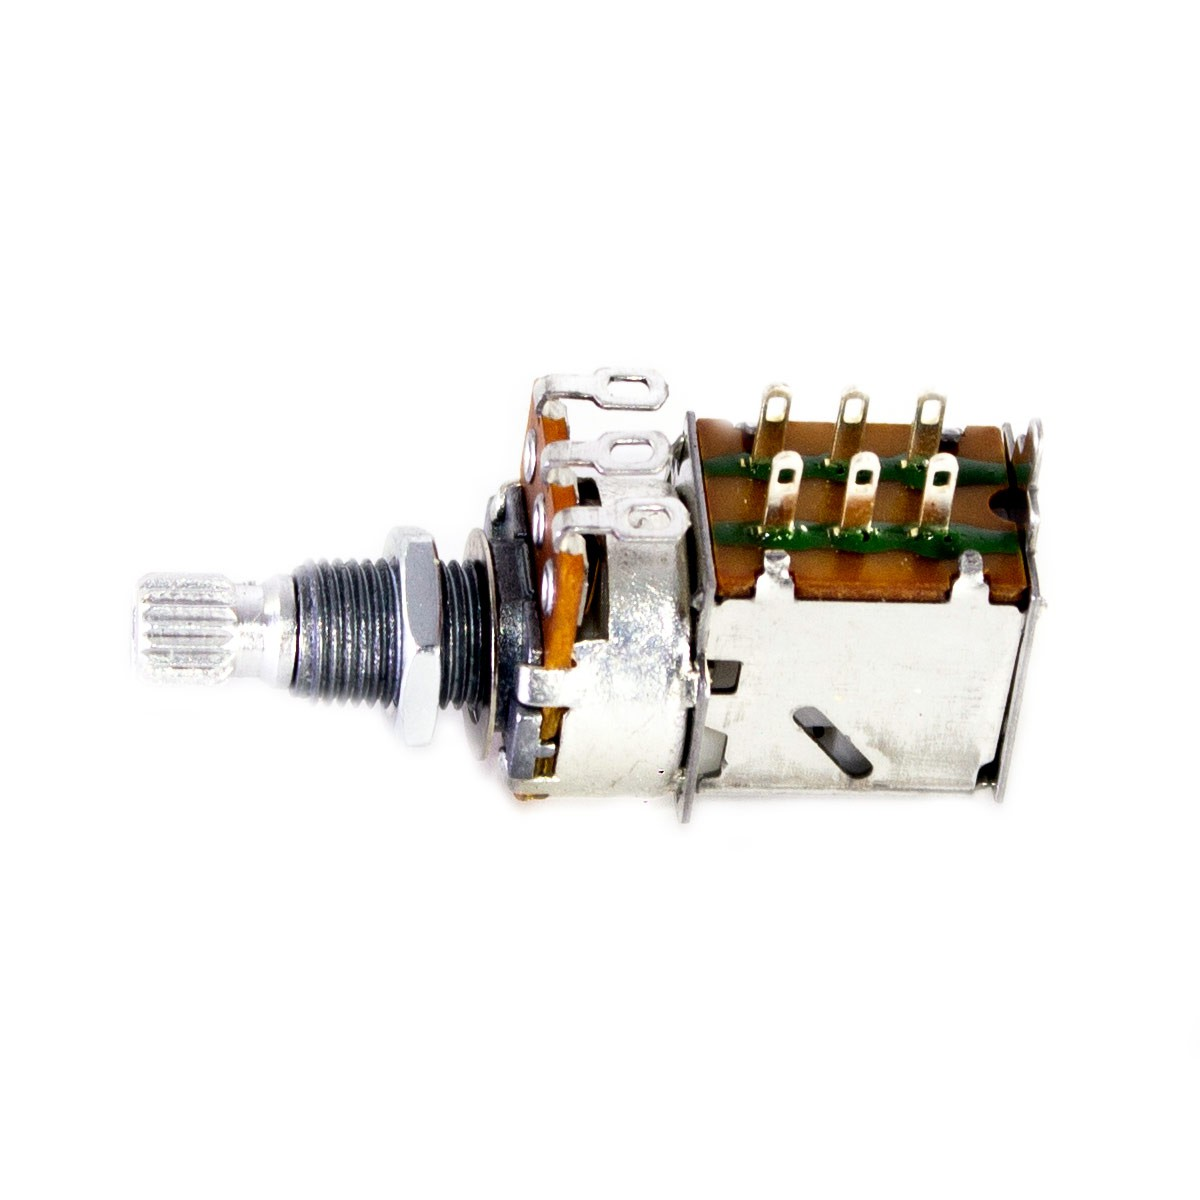 Potenciômetro Spirit Push Pull A500k Base Grande Eixo Longo